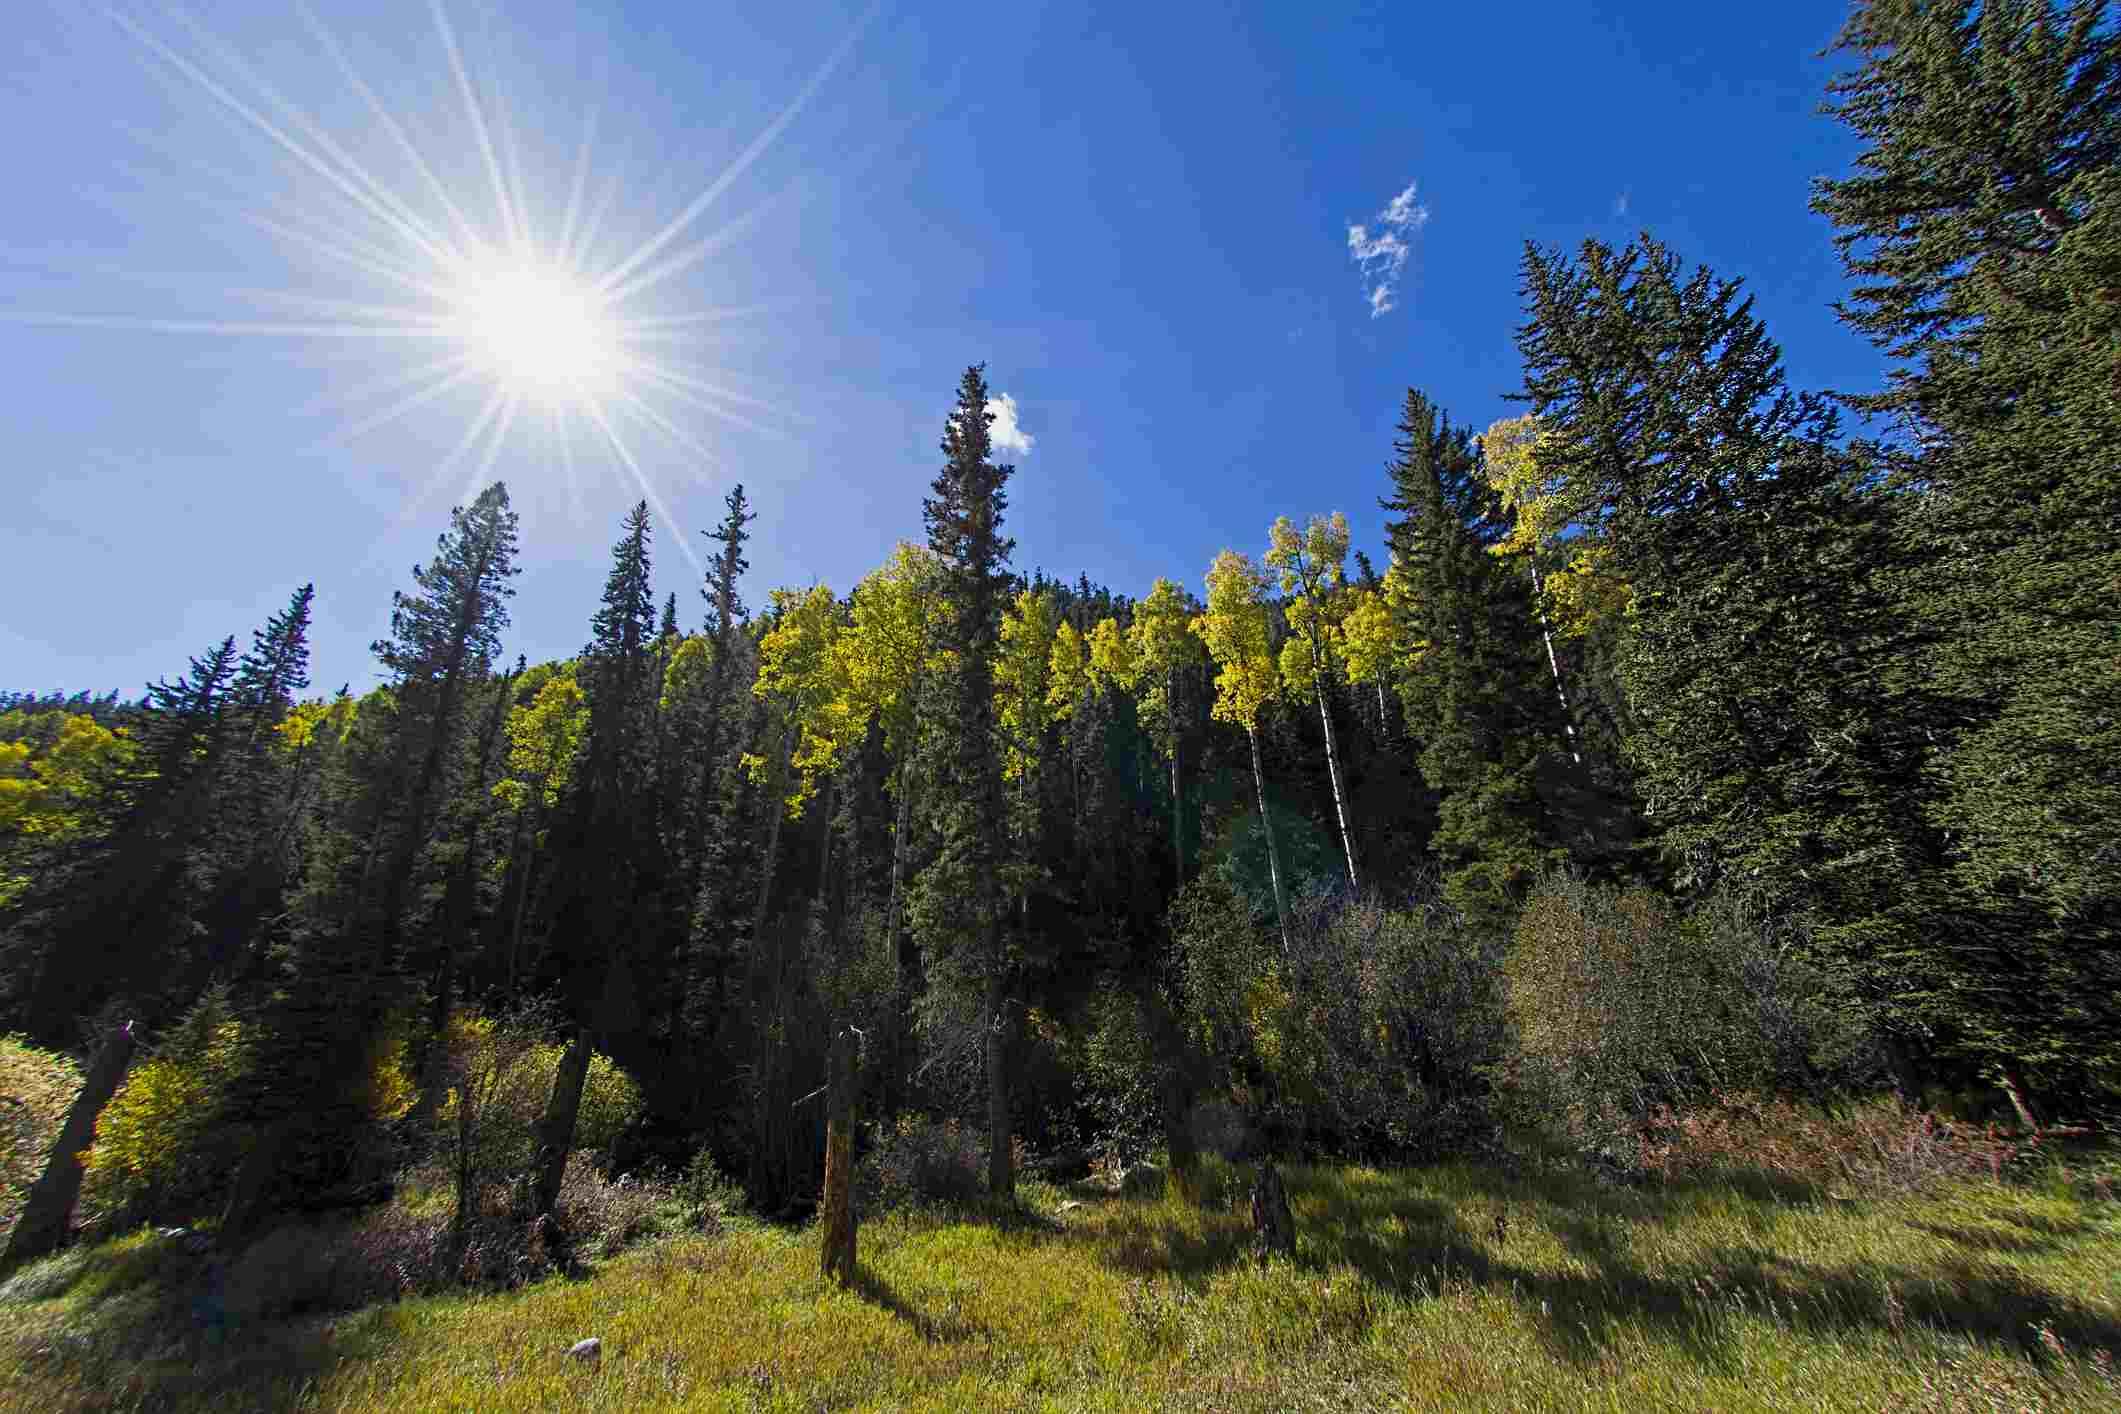 Sun and Aspen grove